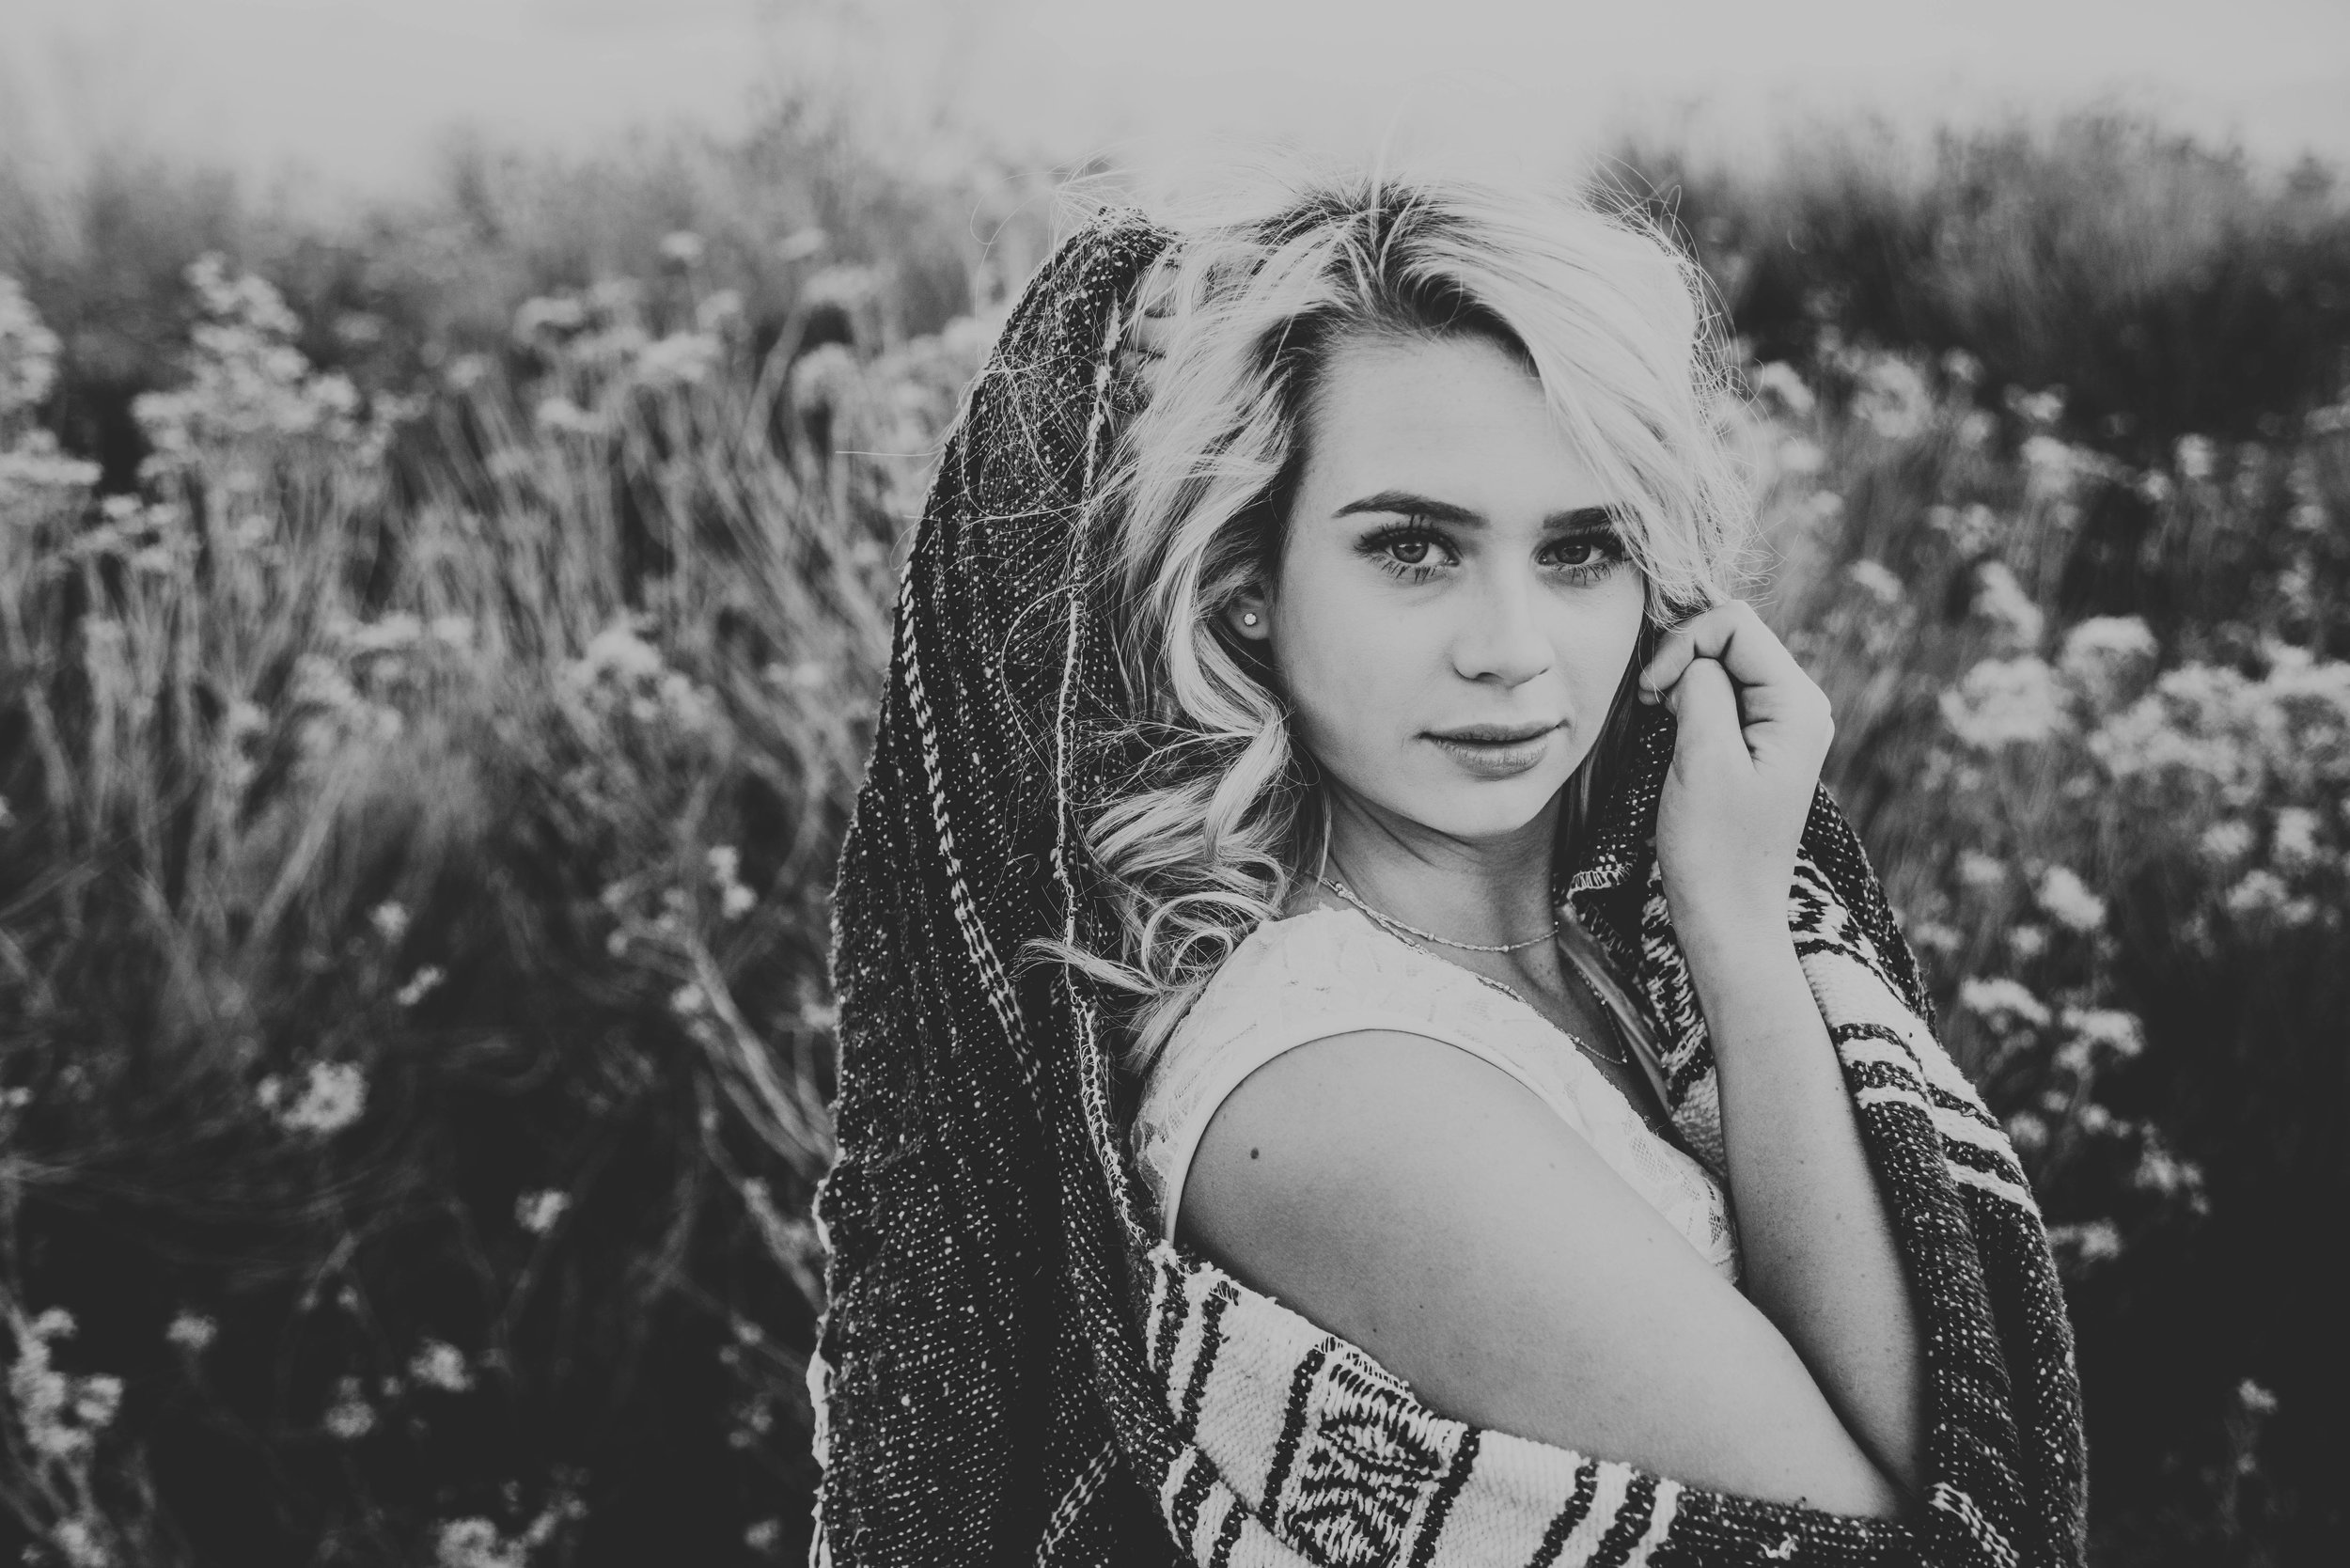 Miss. Miller's Photography | Colorado Senior Photographer | Senior Photo ideas | senior photo ideas with blanket | blanket | southwestern | white top | black and white photos